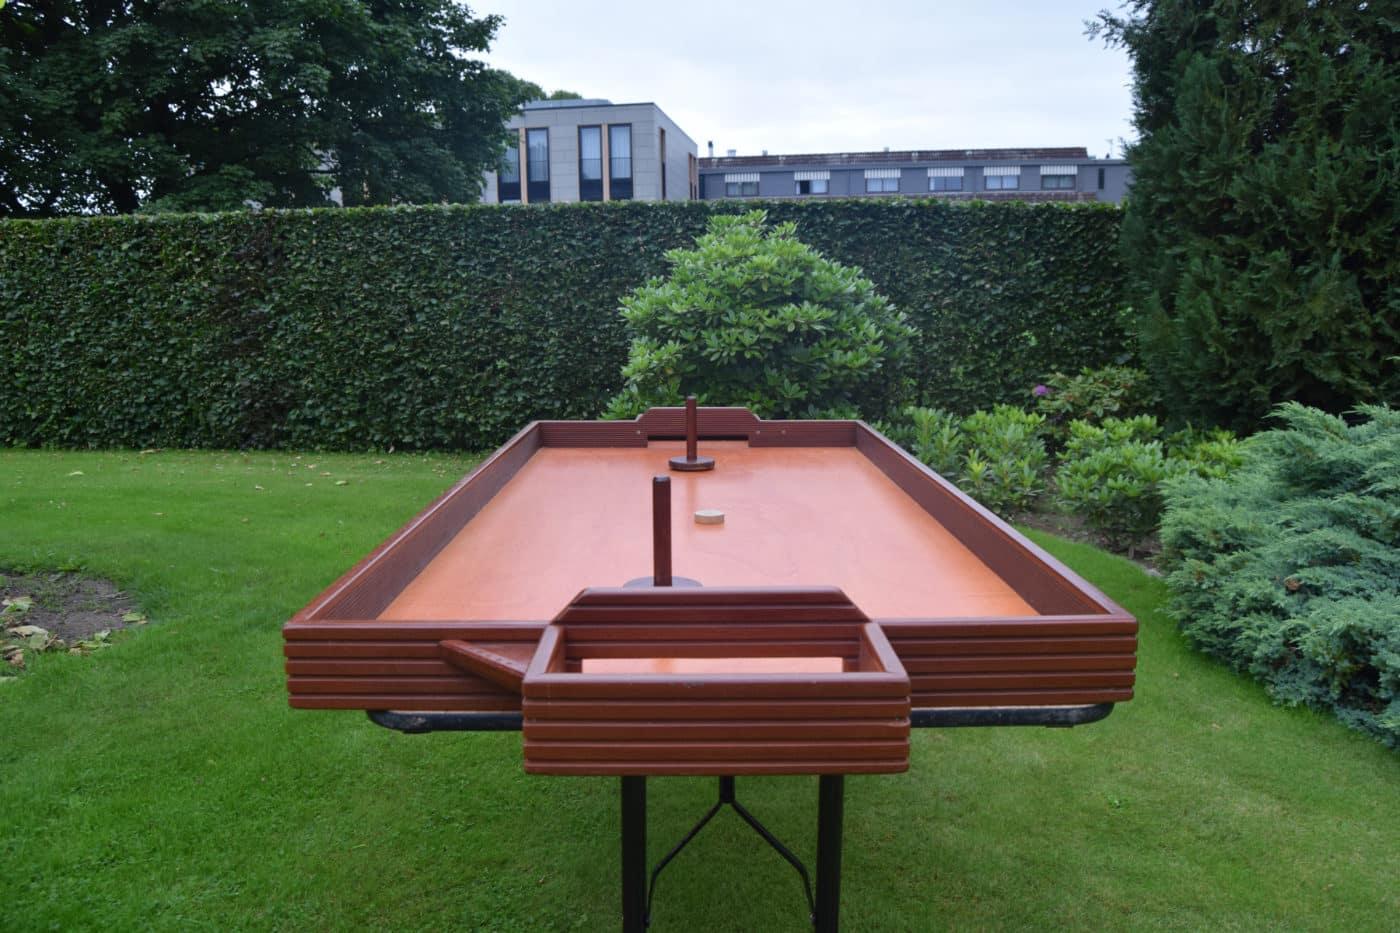 Tafelhockey - Oud Holland spel - vooraanzicht